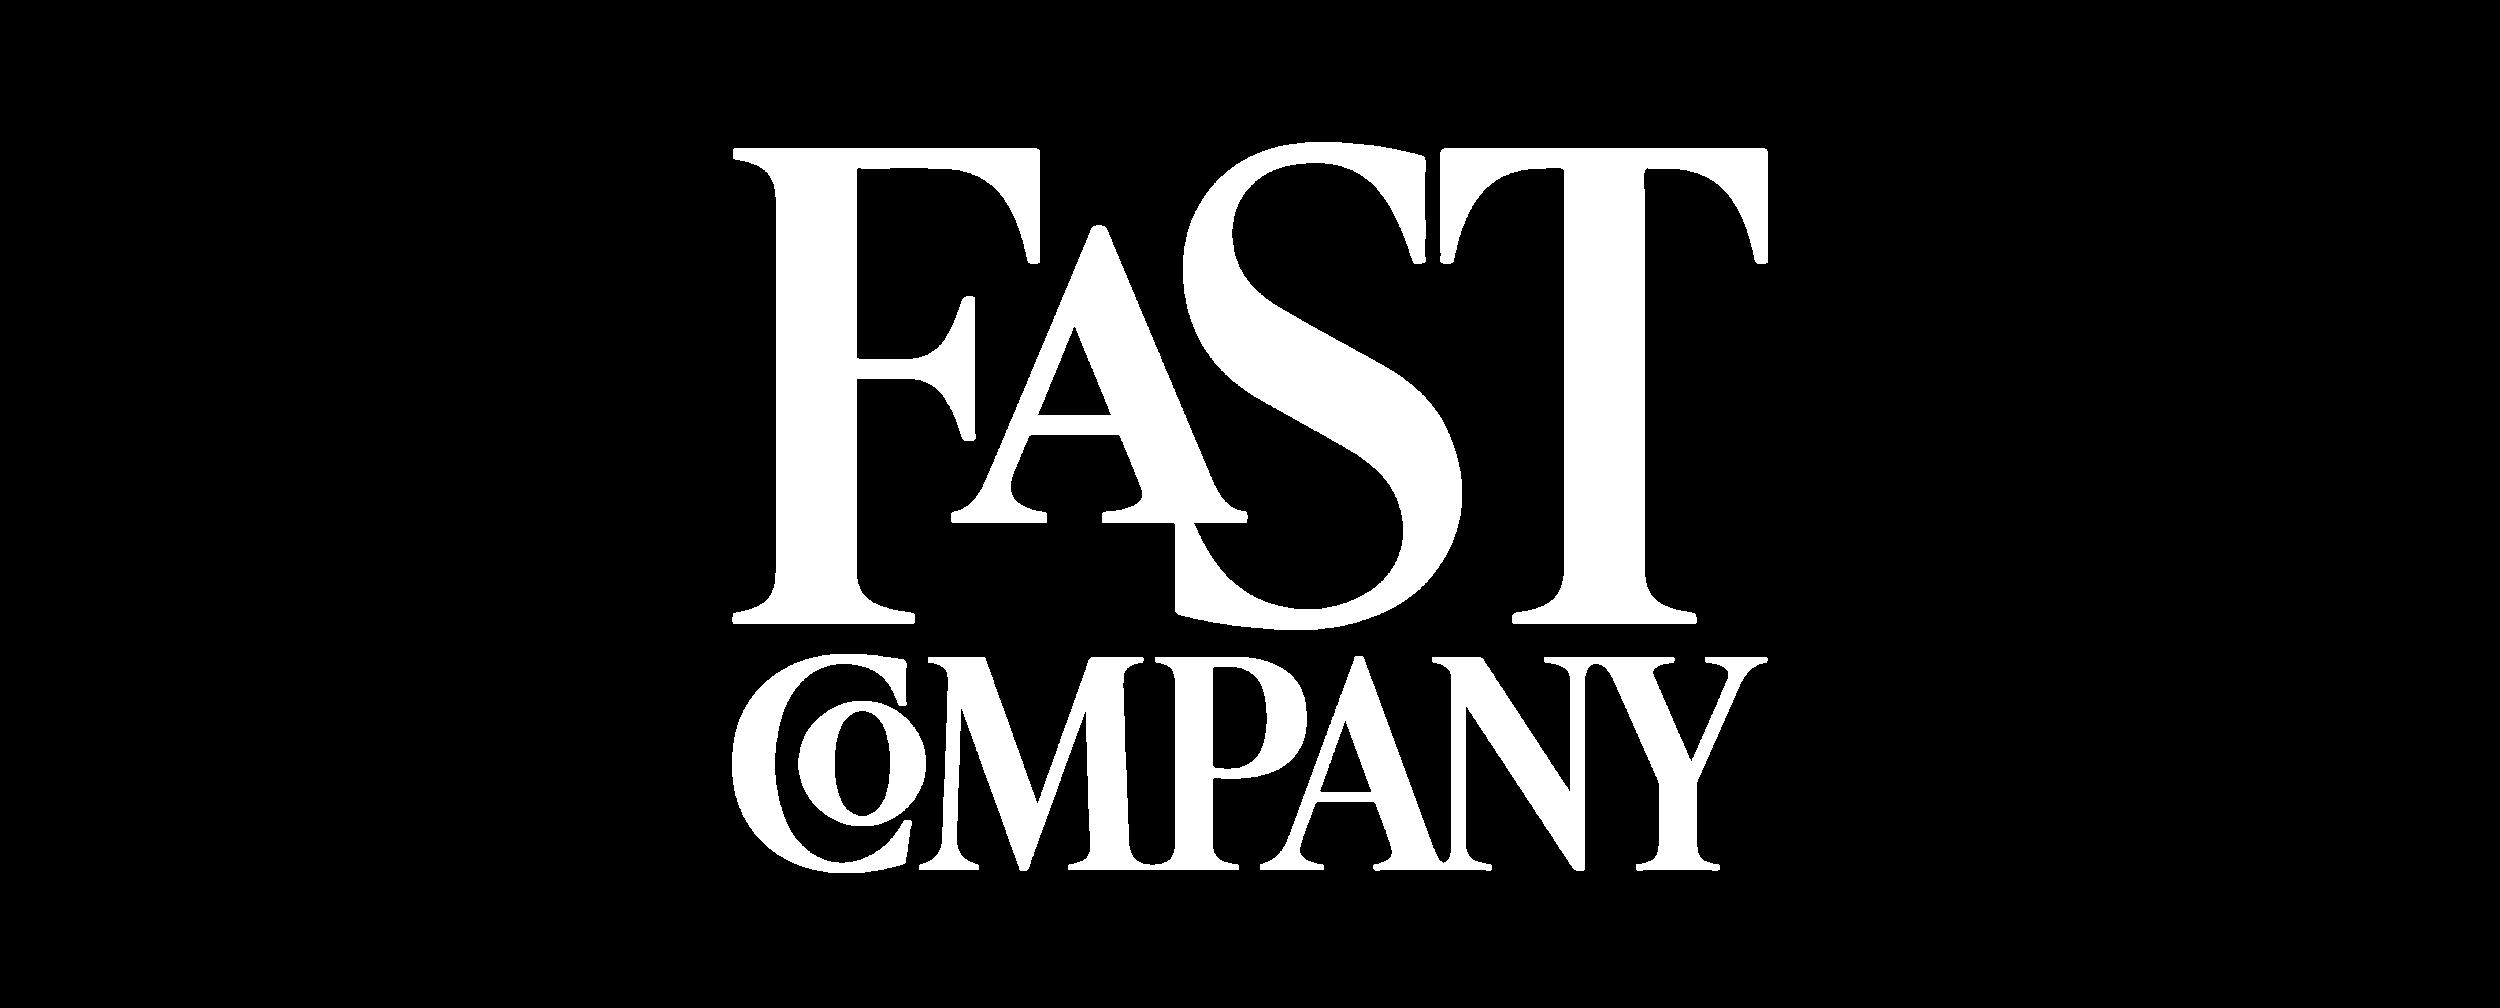 246-2461227_fast-company-transparent-logo-fast-company-logo-transparent-22.png